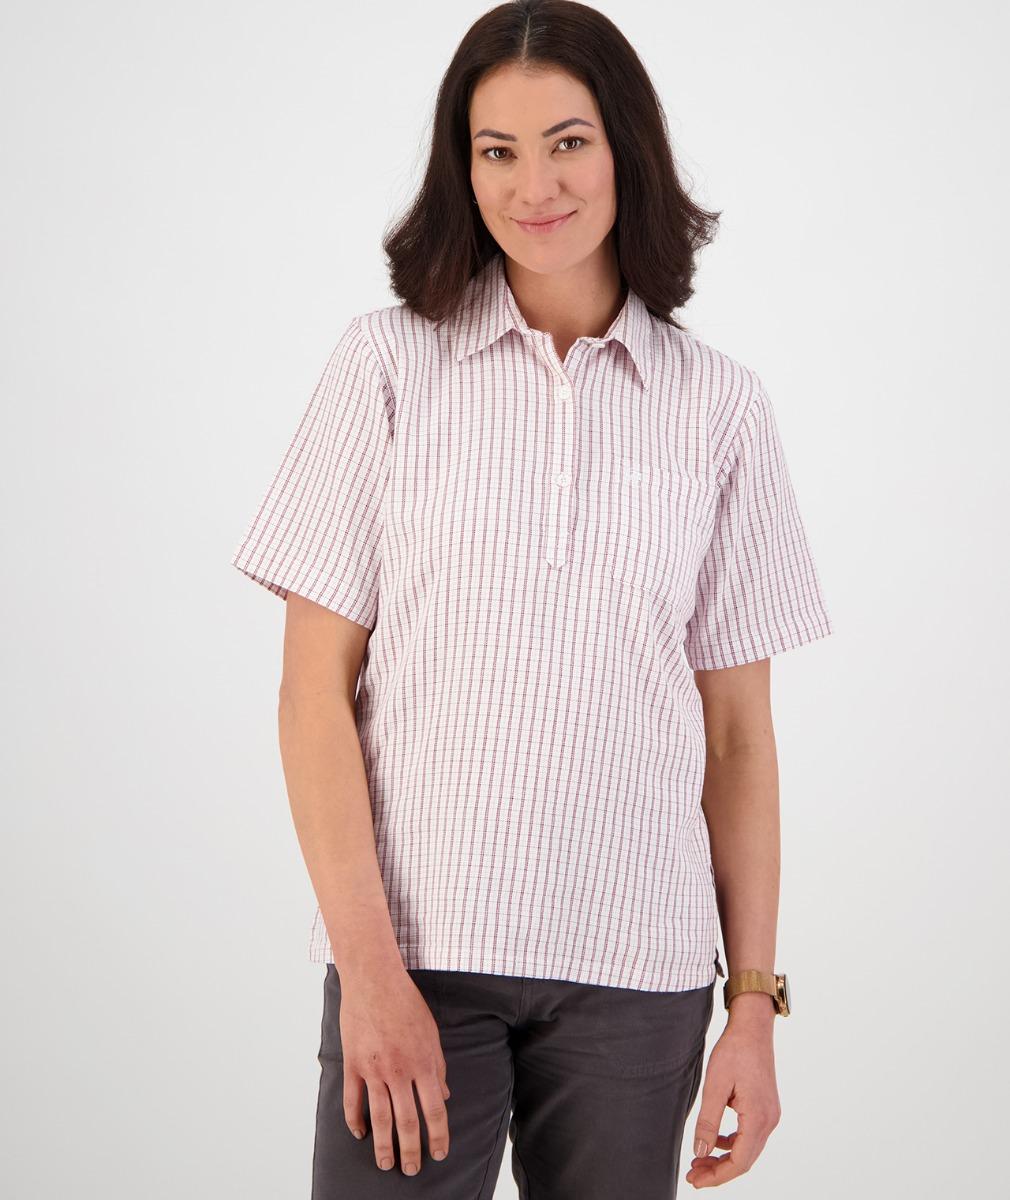 Swanndri Women's Tasman 100% Cotton Short Sleeve Shirt in Plum/Pink